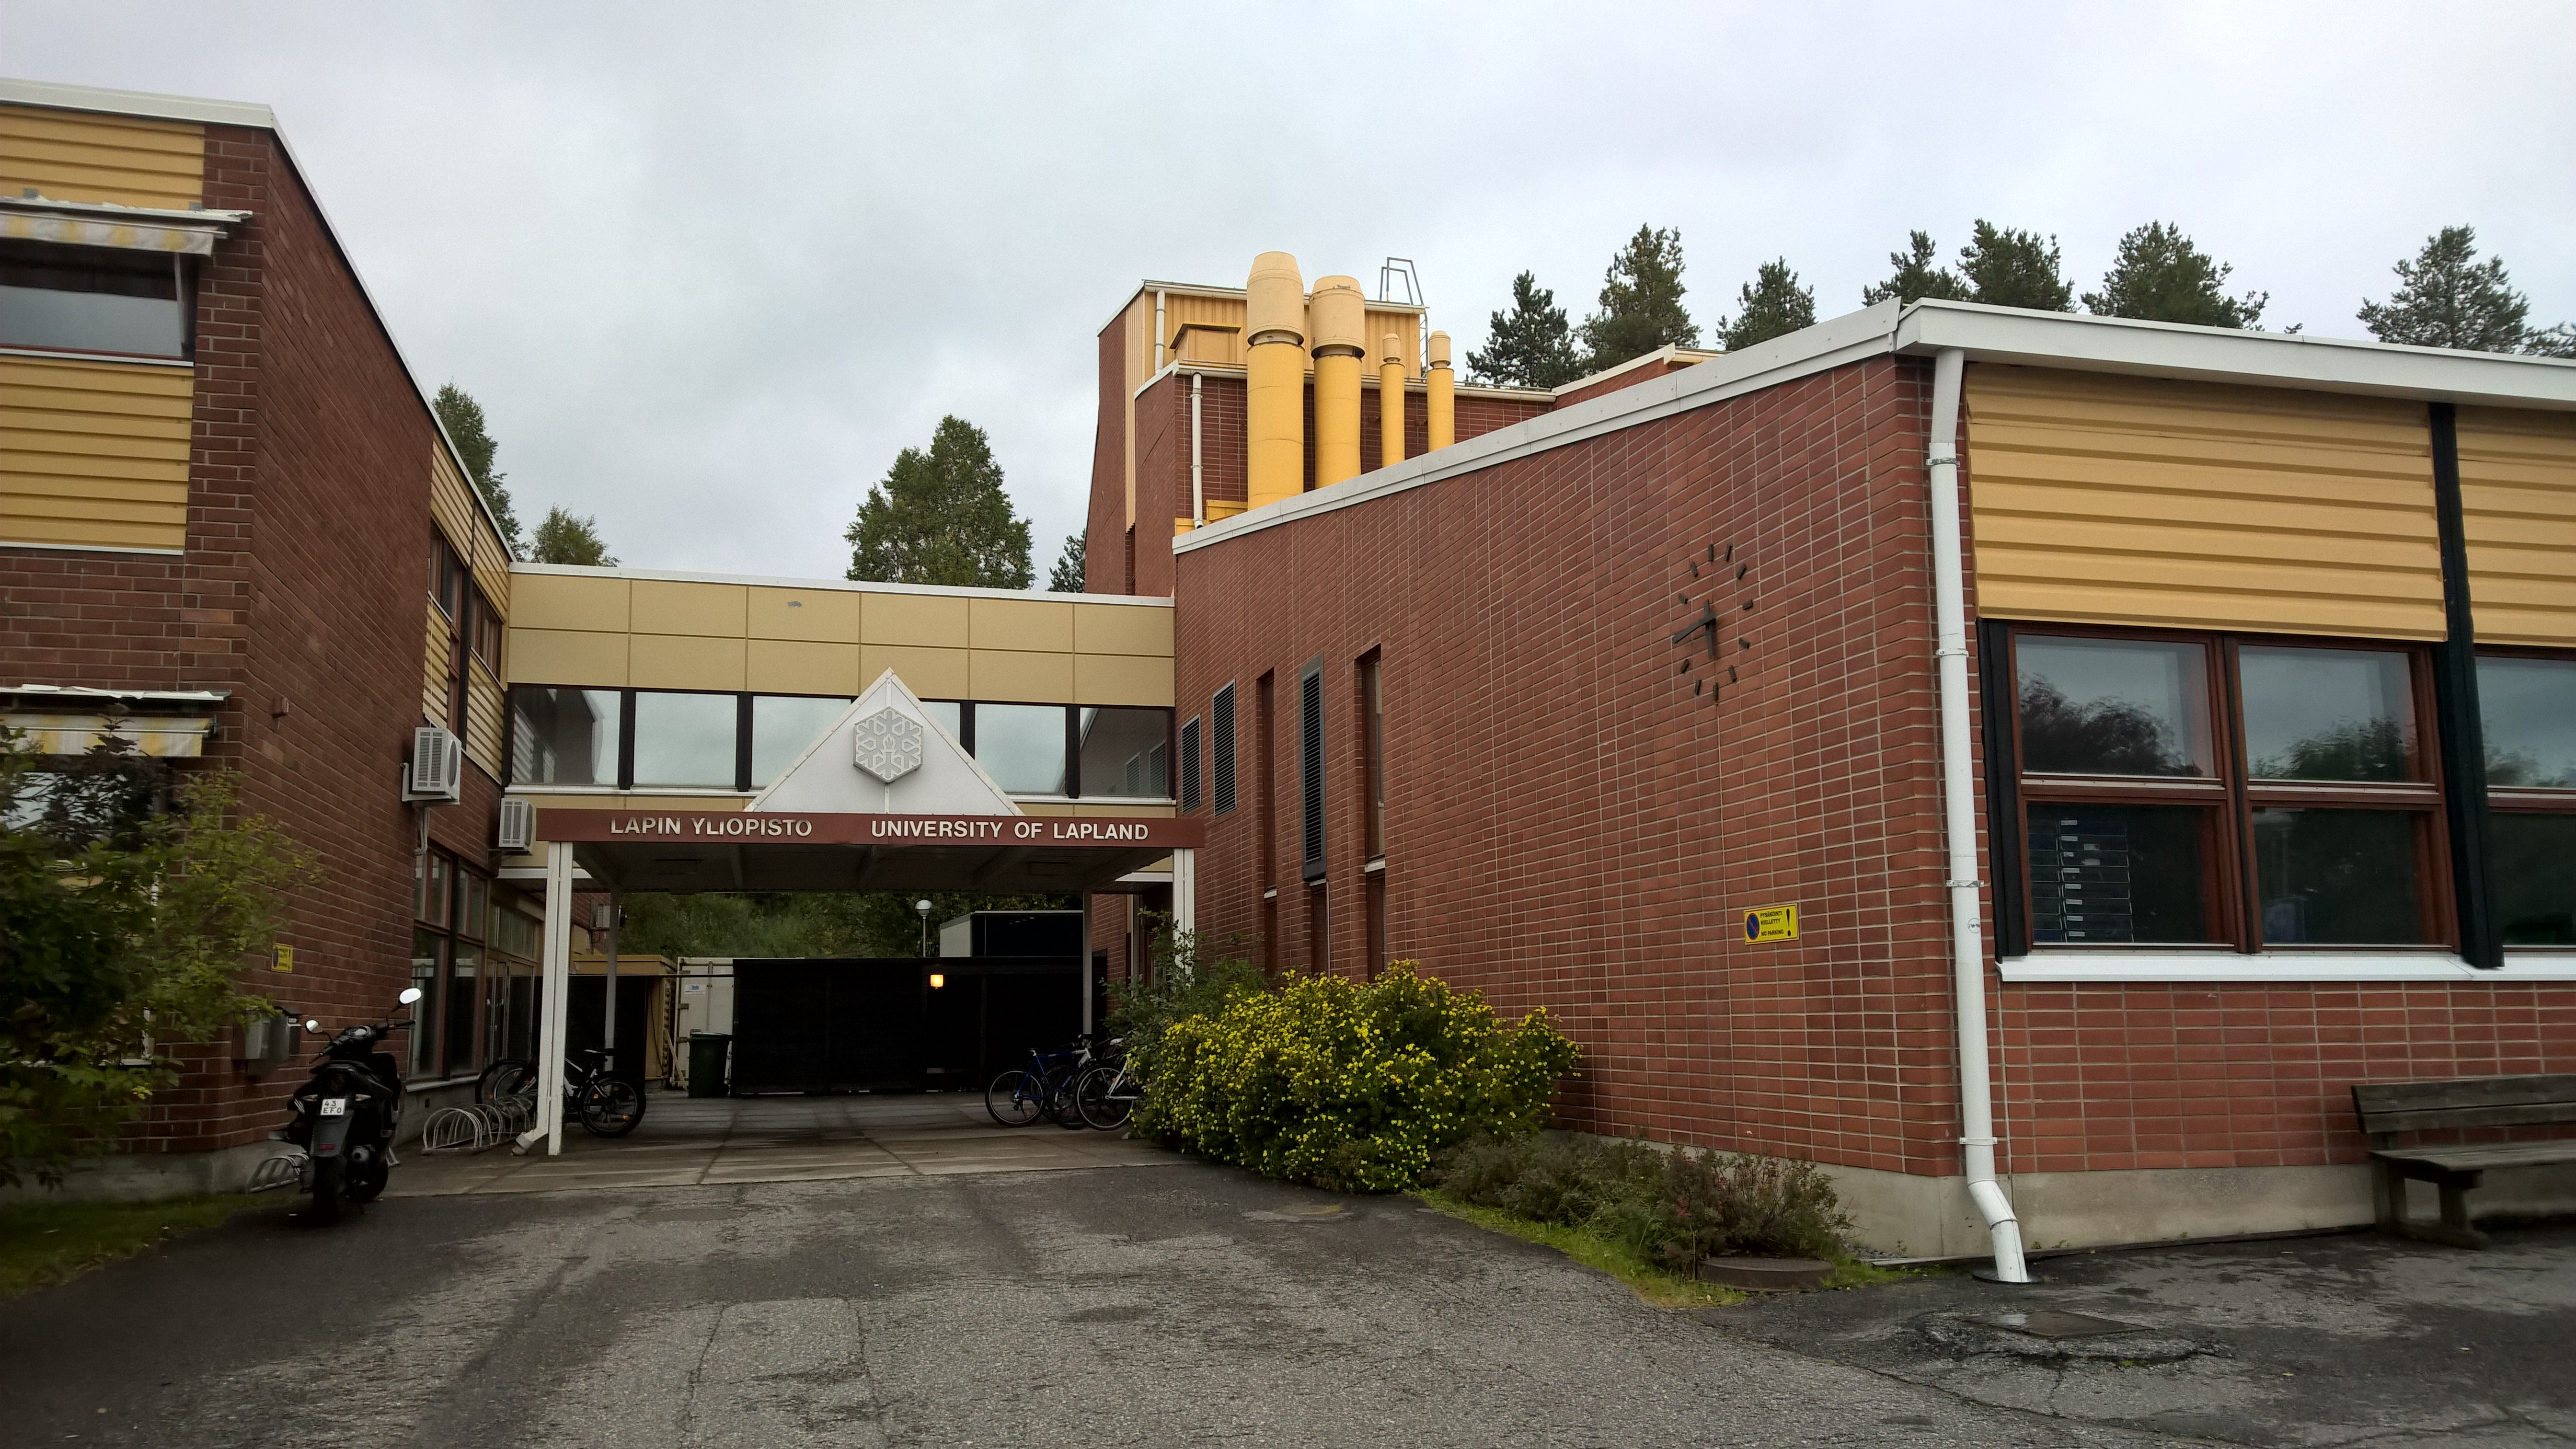 Toimitila, Siljotie 2, Rovaniemi, Rovaniemi